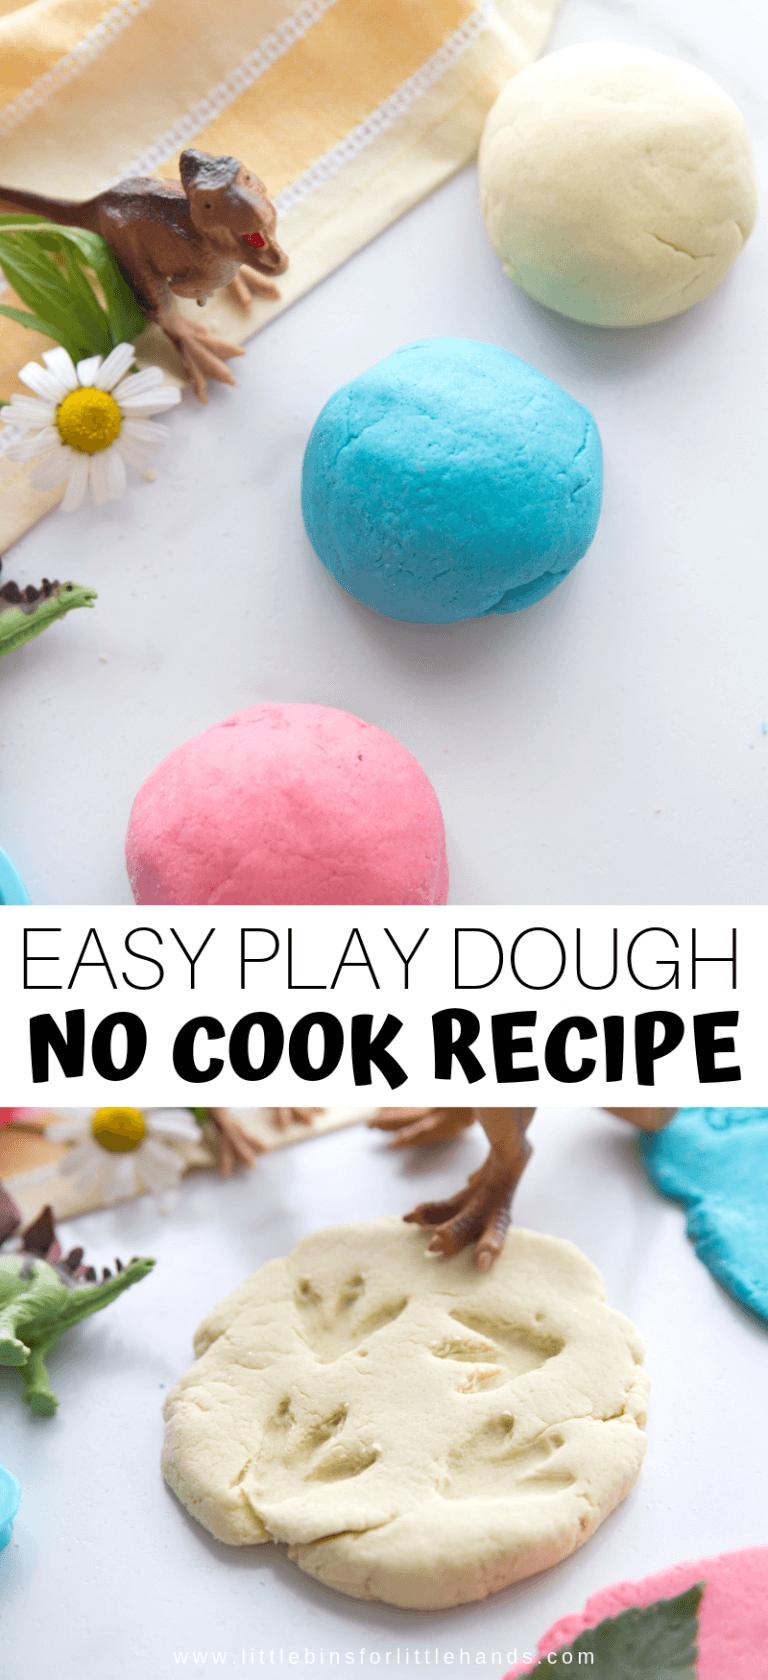 The Best No Cook Playdough Recipe! Cooked playdough